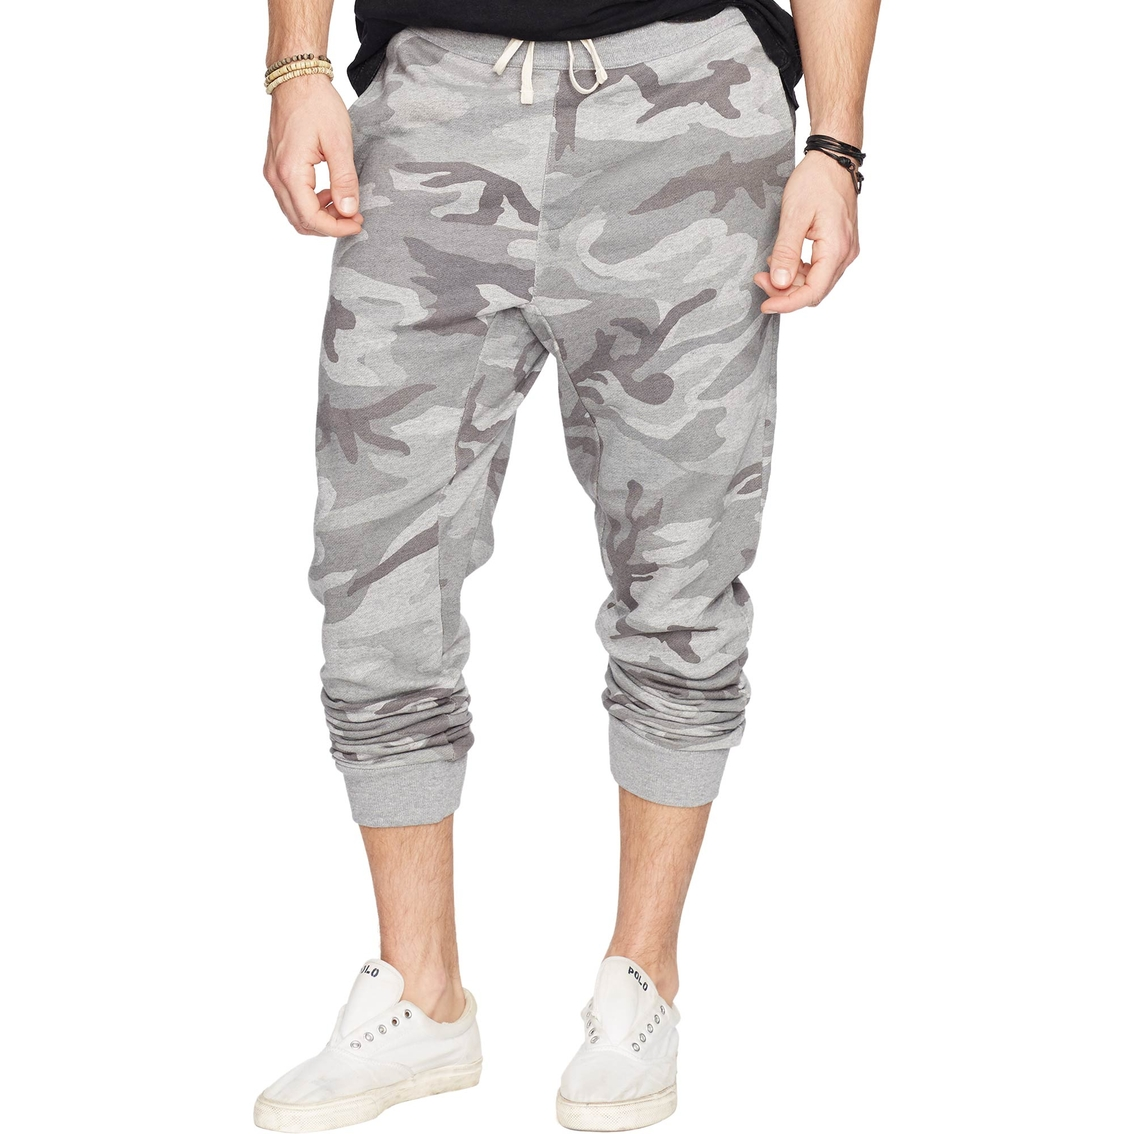 Denim   Supply Ralph Lauren Camo Fleece Jogger Pants  dc7e9019ec443